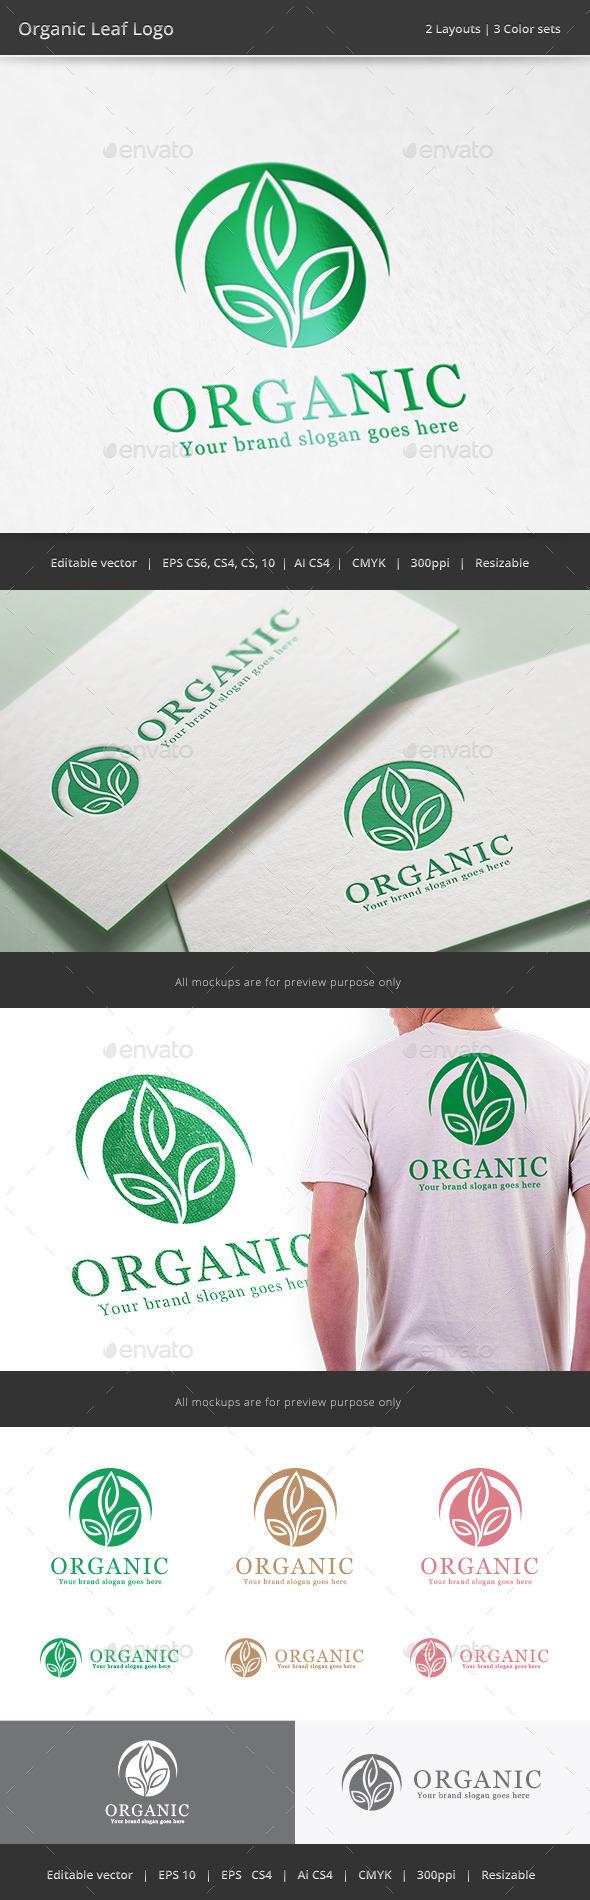 Organic Leaf Logo - Nature Logo Templates